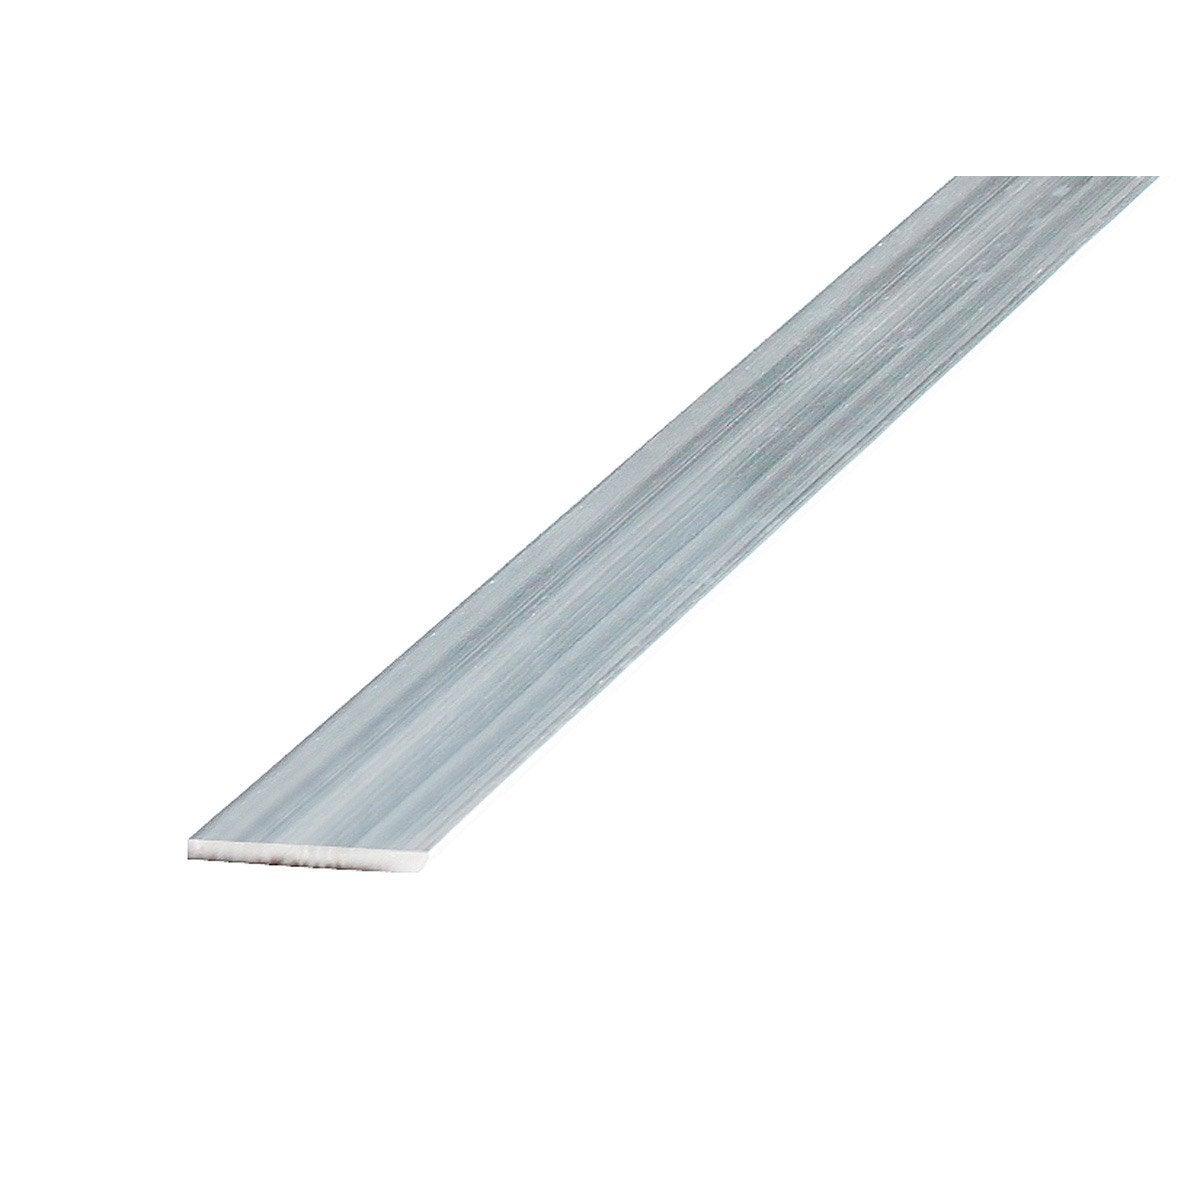 Champlat En Aluminium 20 X 2 Mm L 240 M